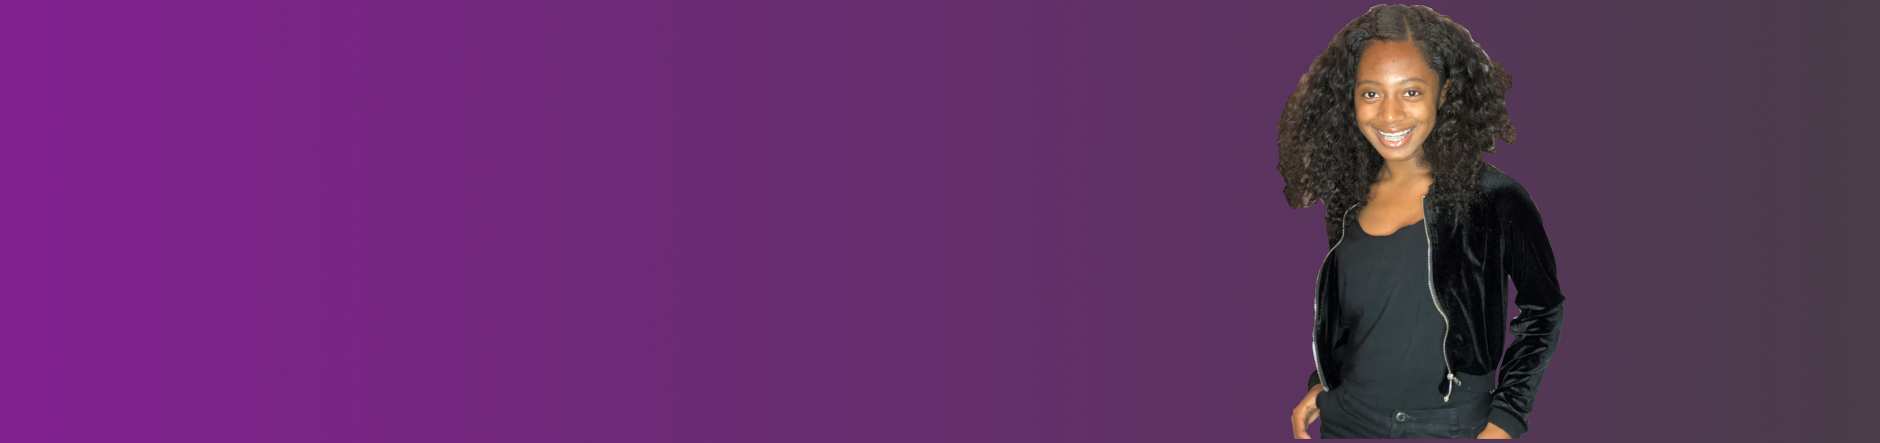 Chelsea Haye - Teenage Entrepreneur - Iridescent by Chelsea Haye